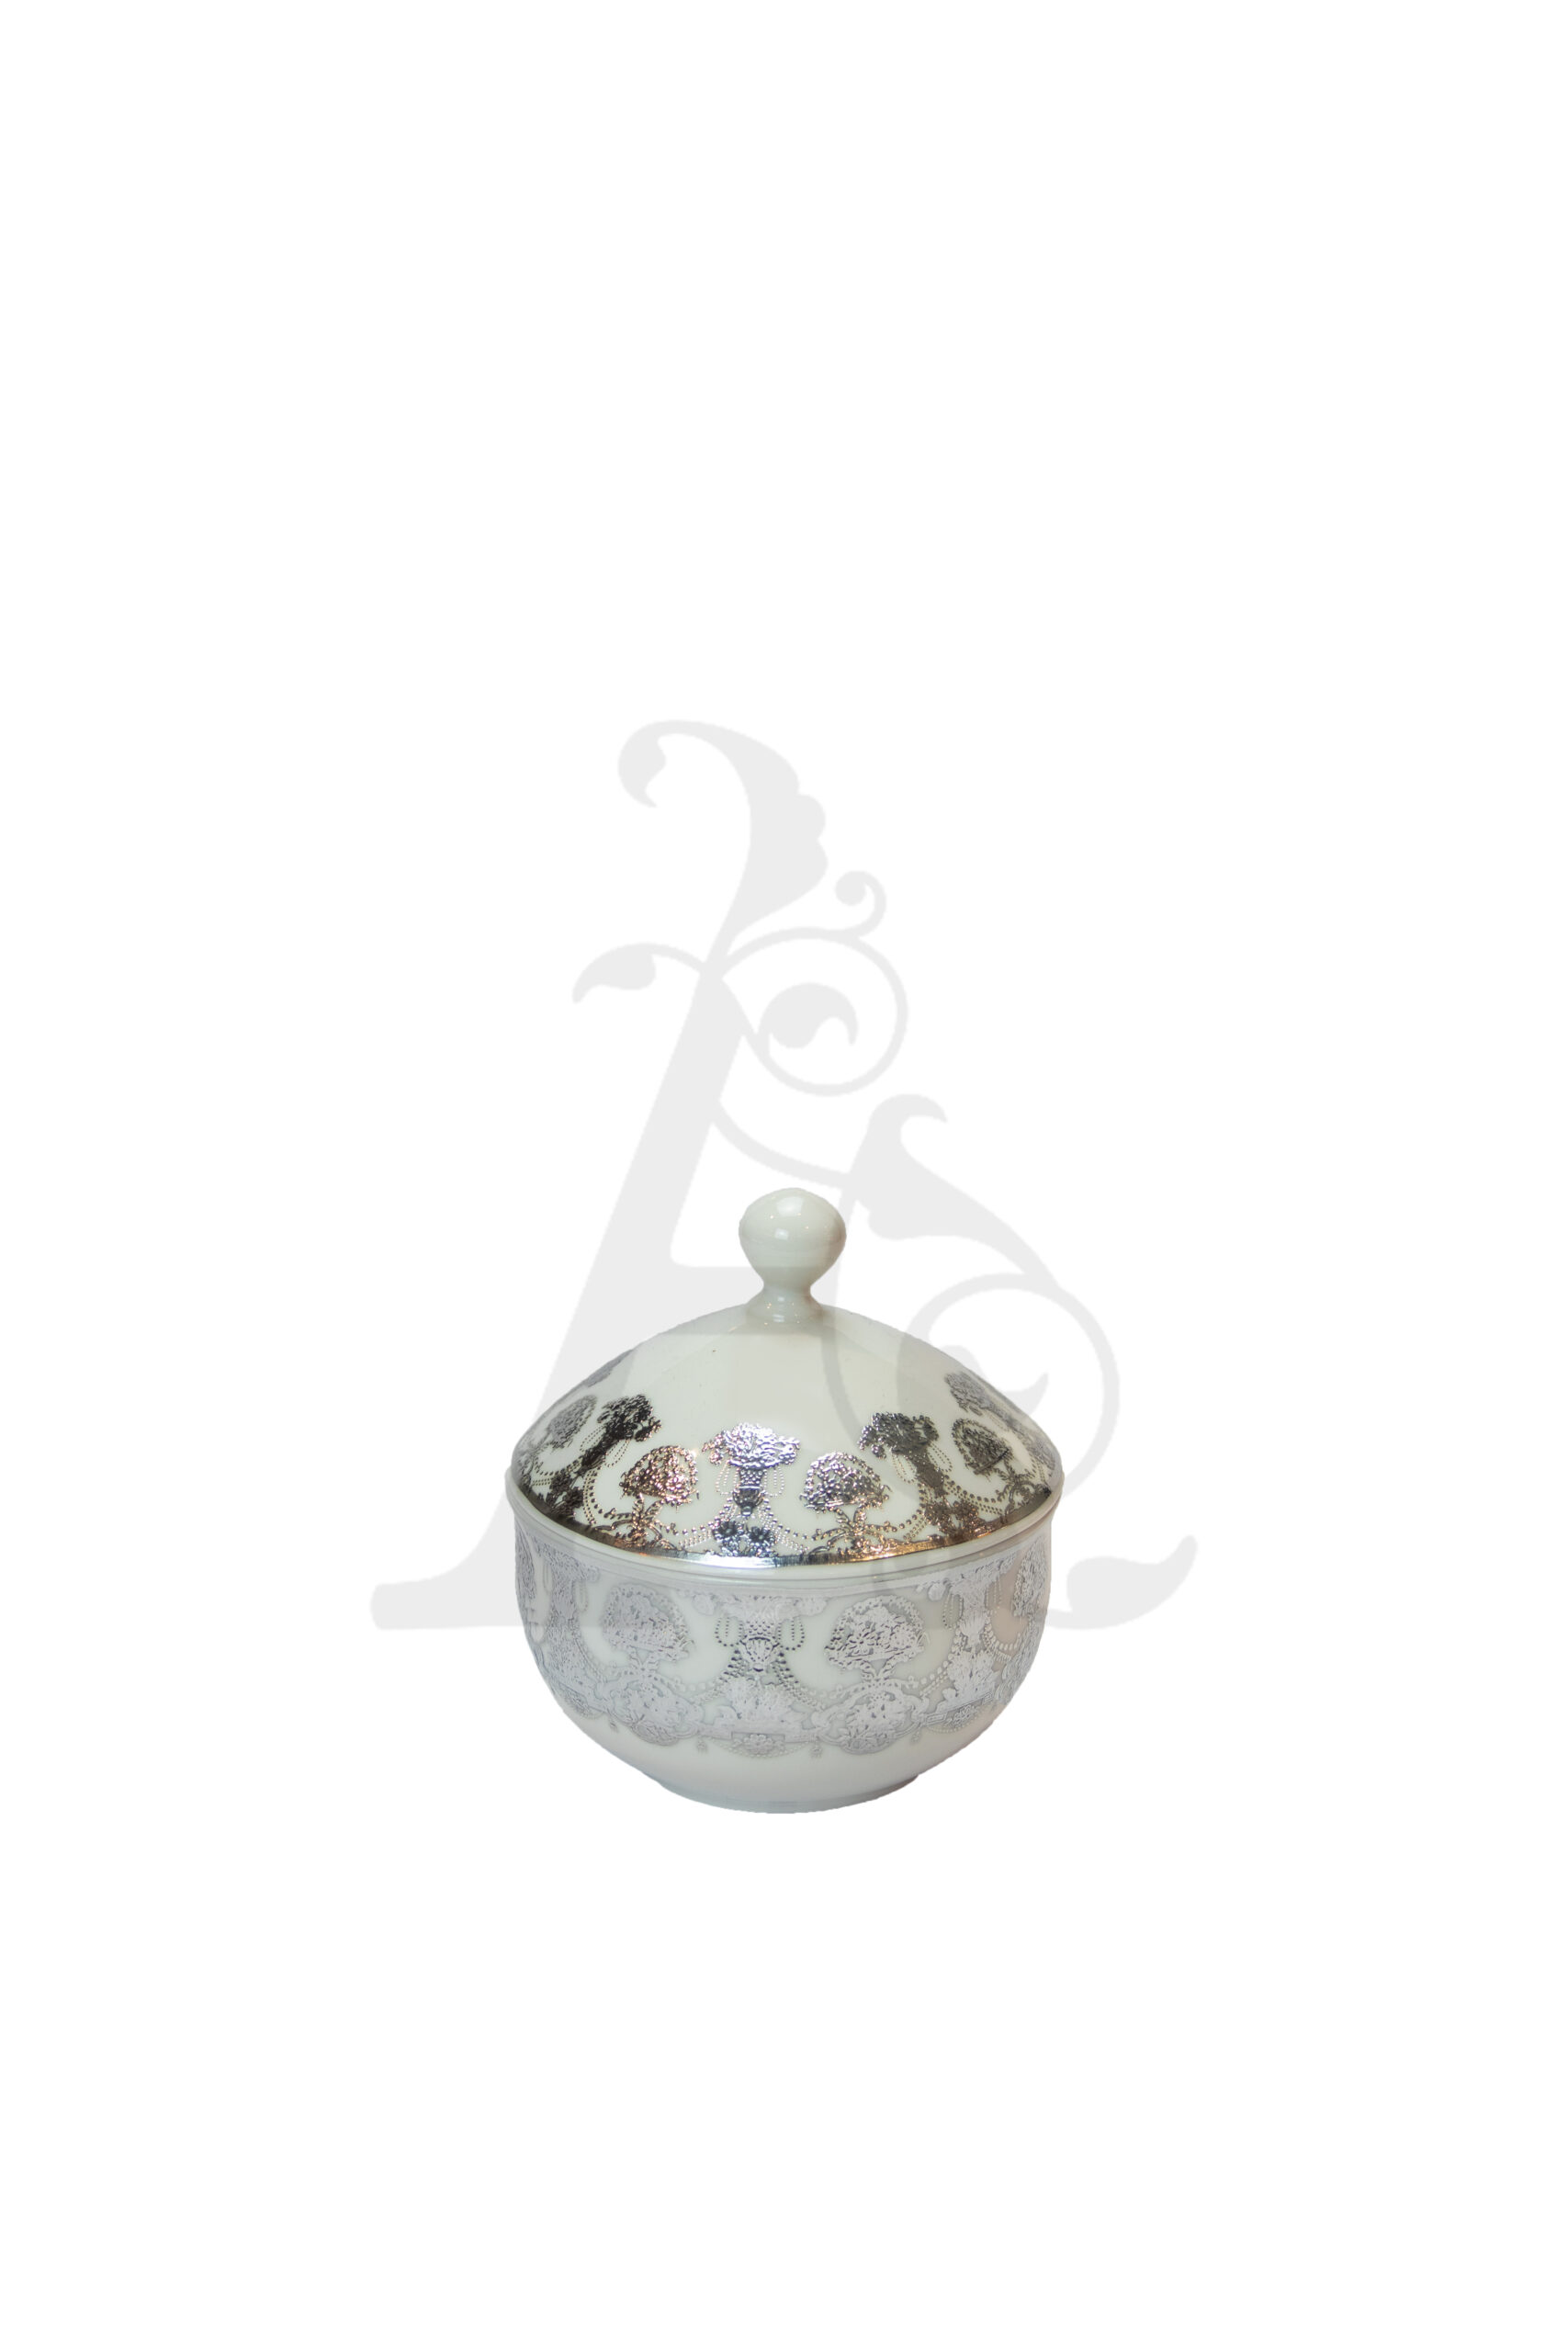 Buy Victoriana sugar pot with cover - Silver 3